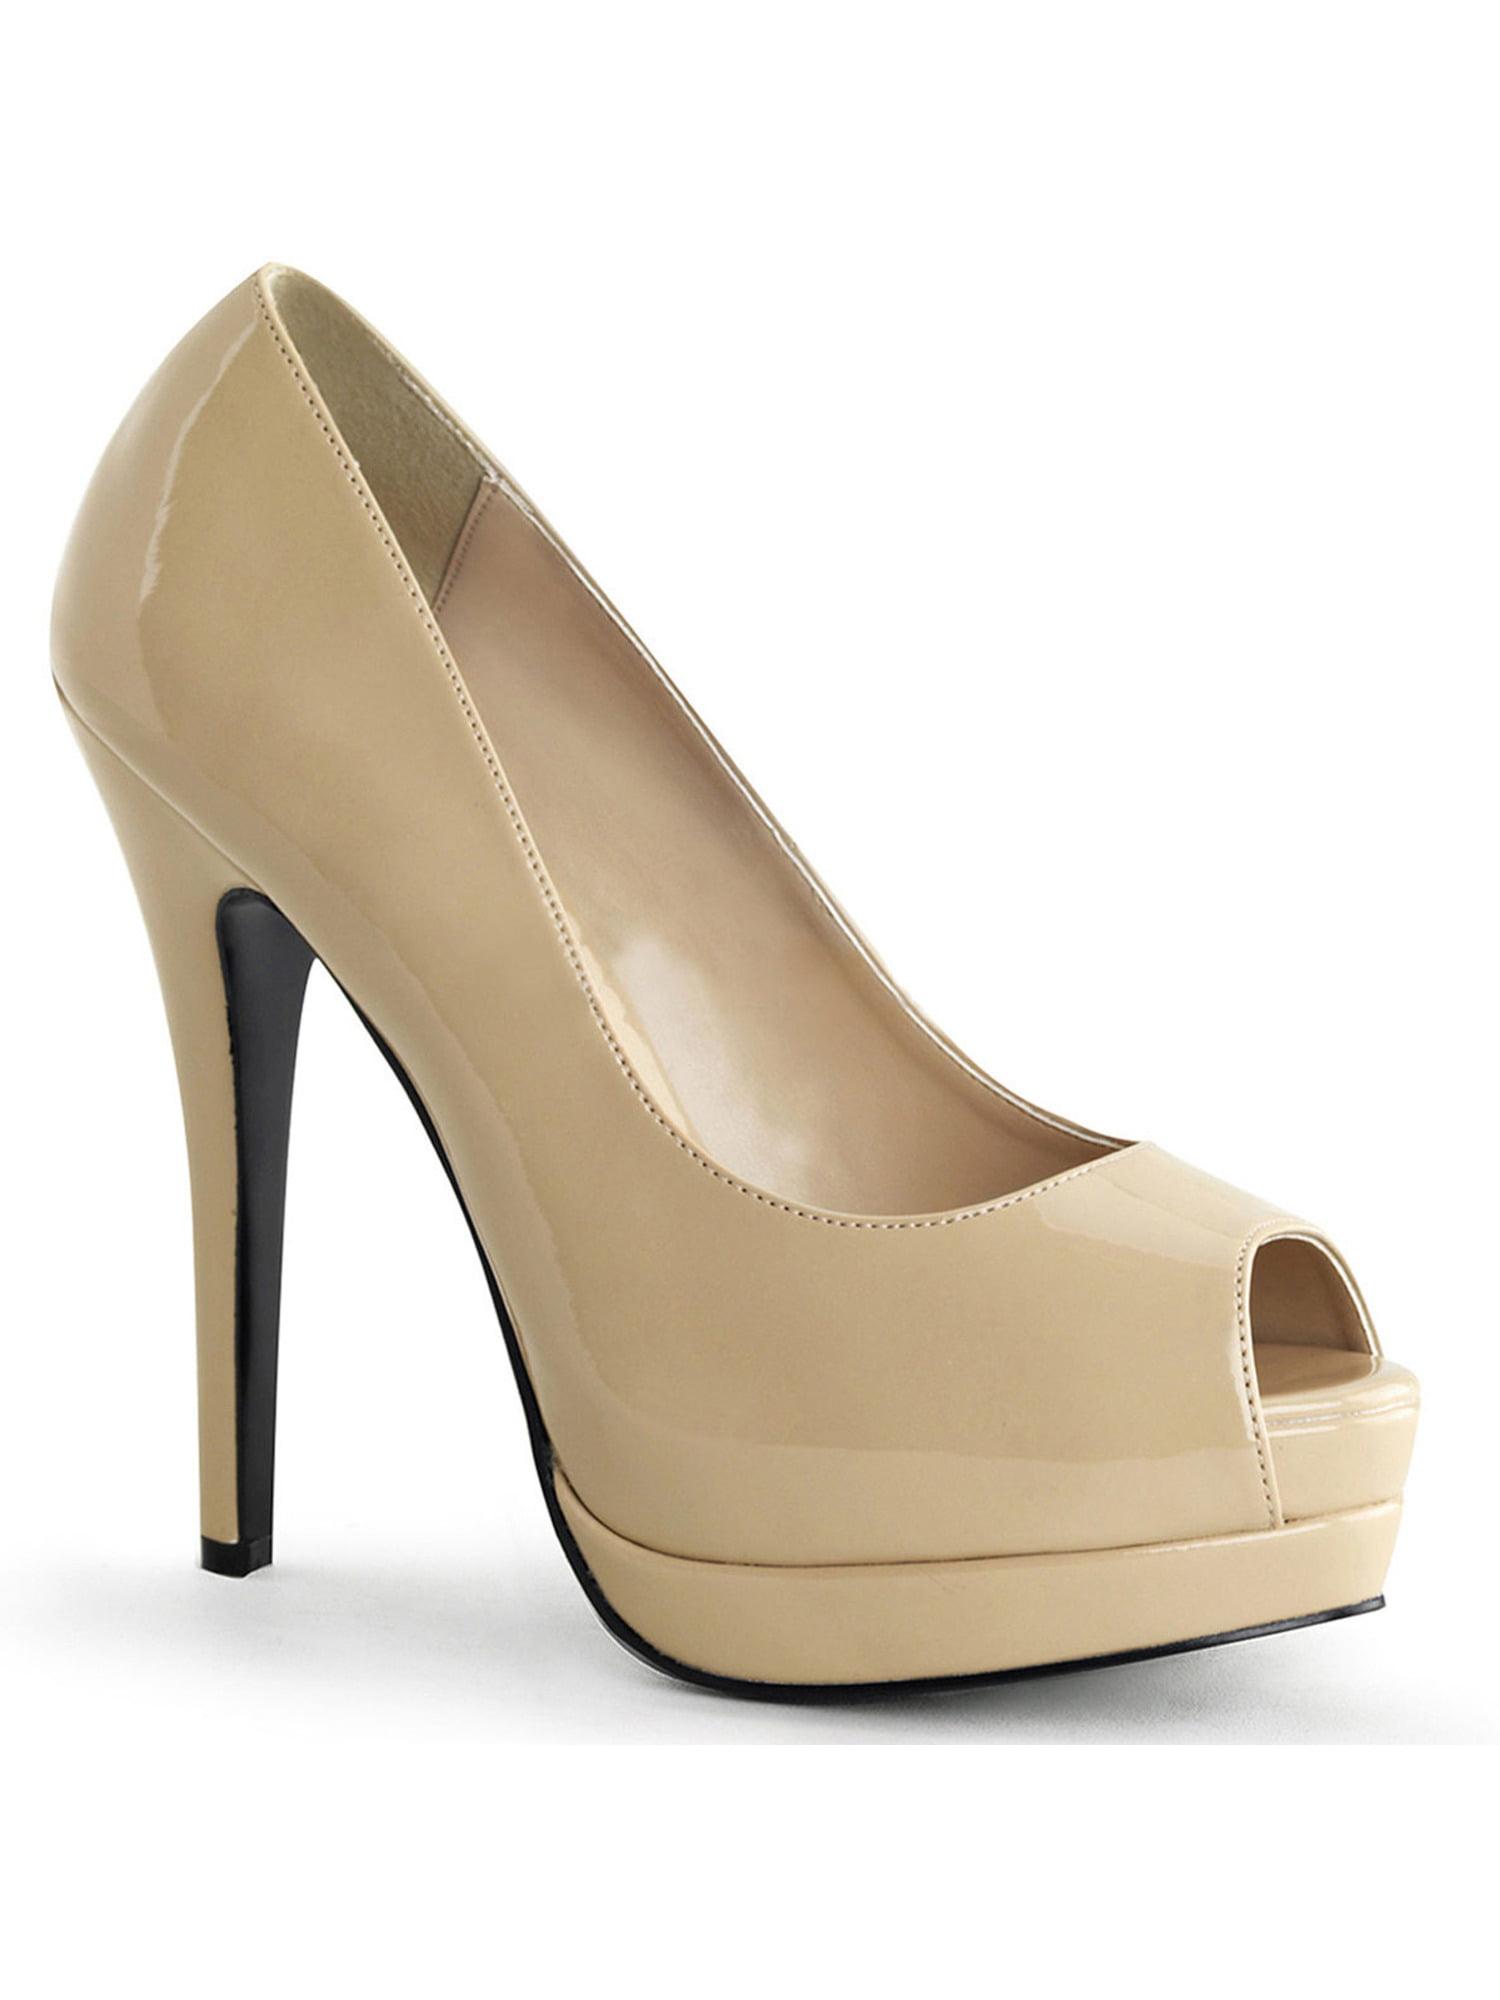 Womens Elegant Glossy Patent Nude Peep Toe Pumps 5.25'' High Heel Shoes